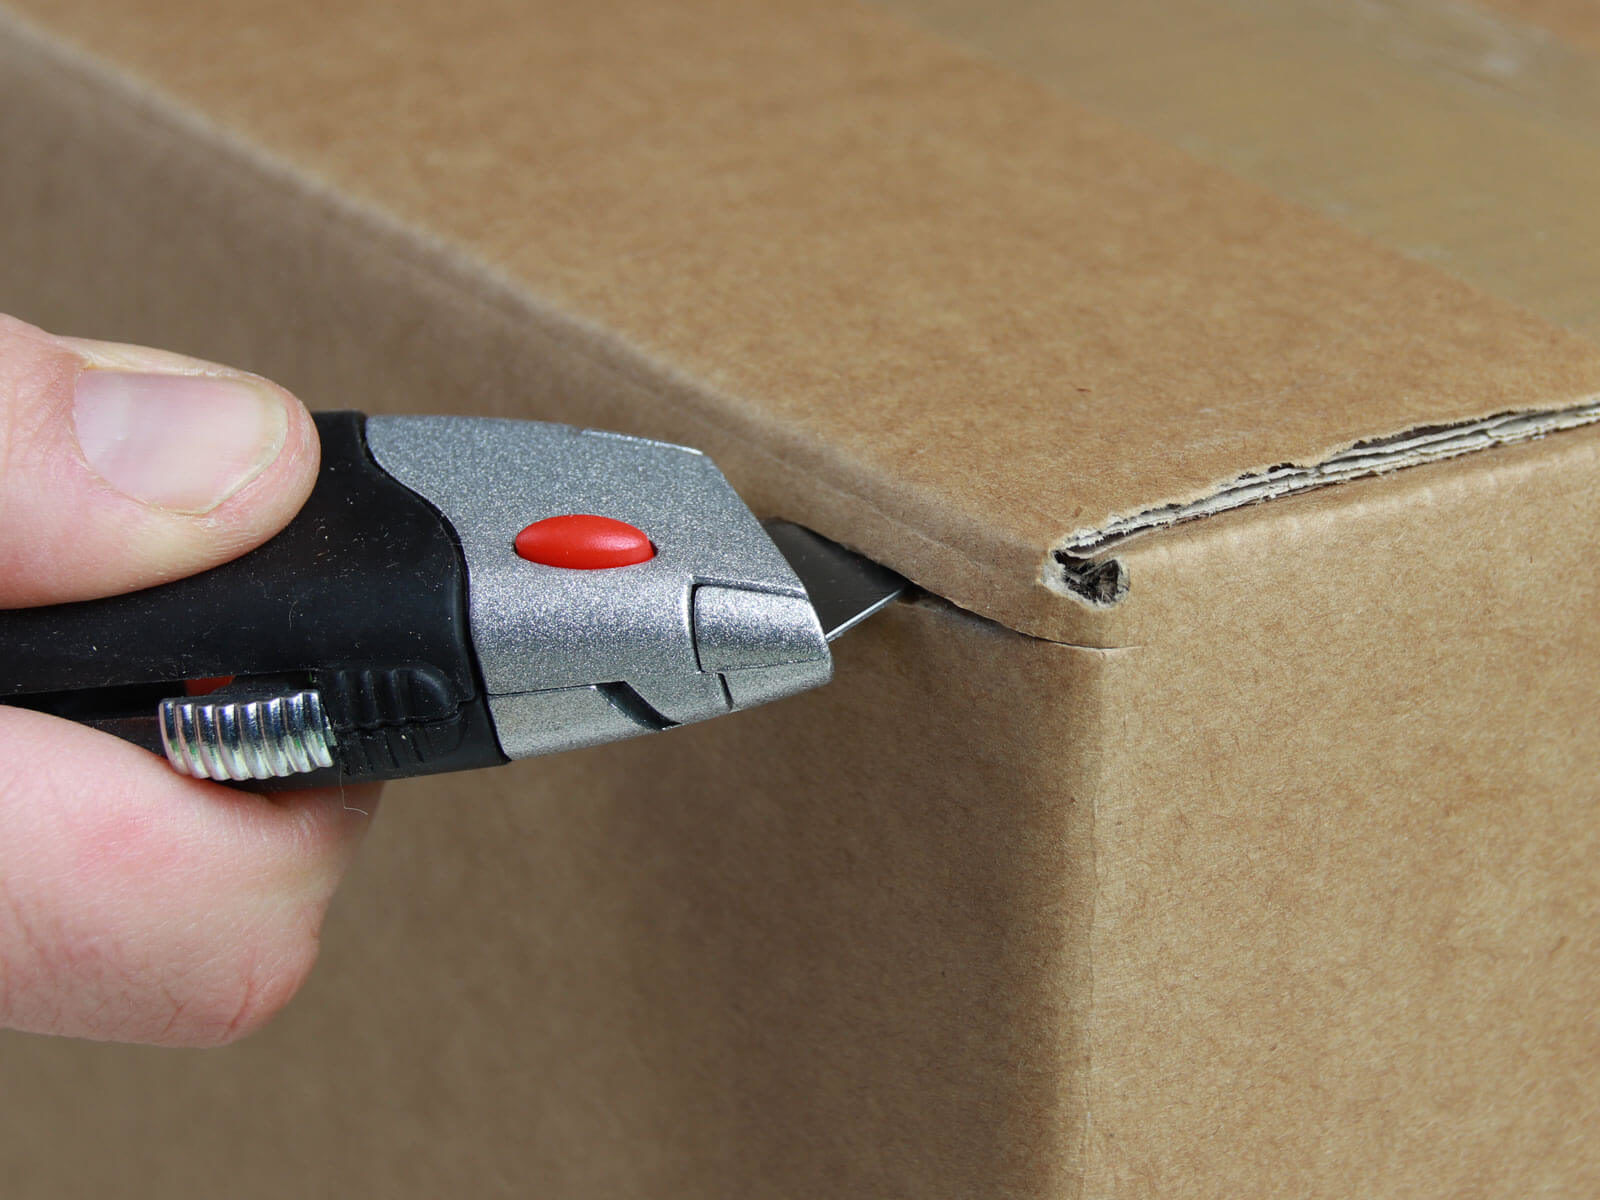 U012 Cuttermesser manueller Klingenrückzug Karton schneiden abdeckeln CURT-tools